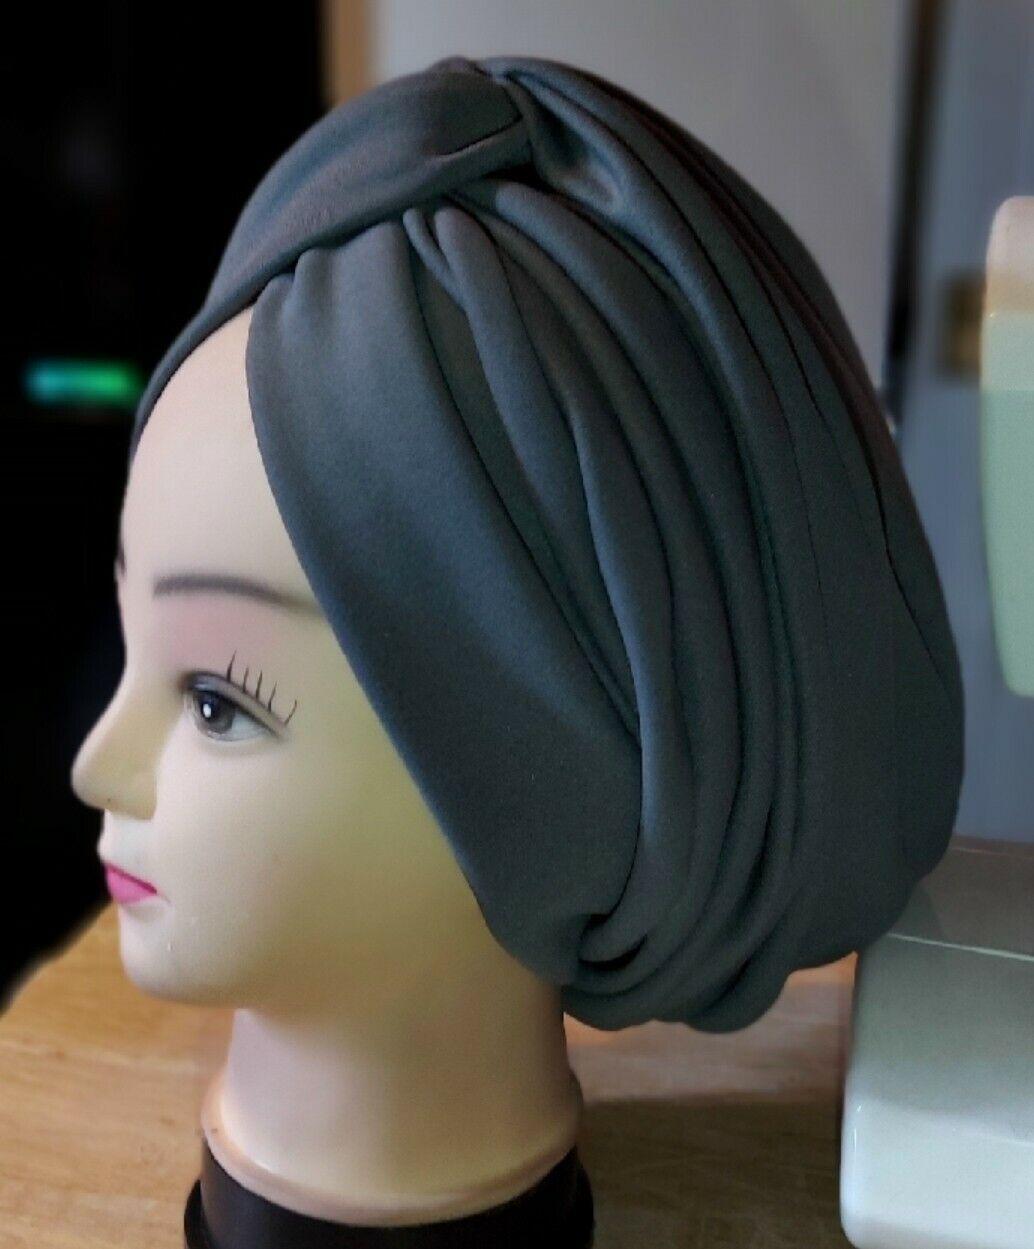 Nigeria African Women Elegant Turban cap auto gele (full pleated turban)